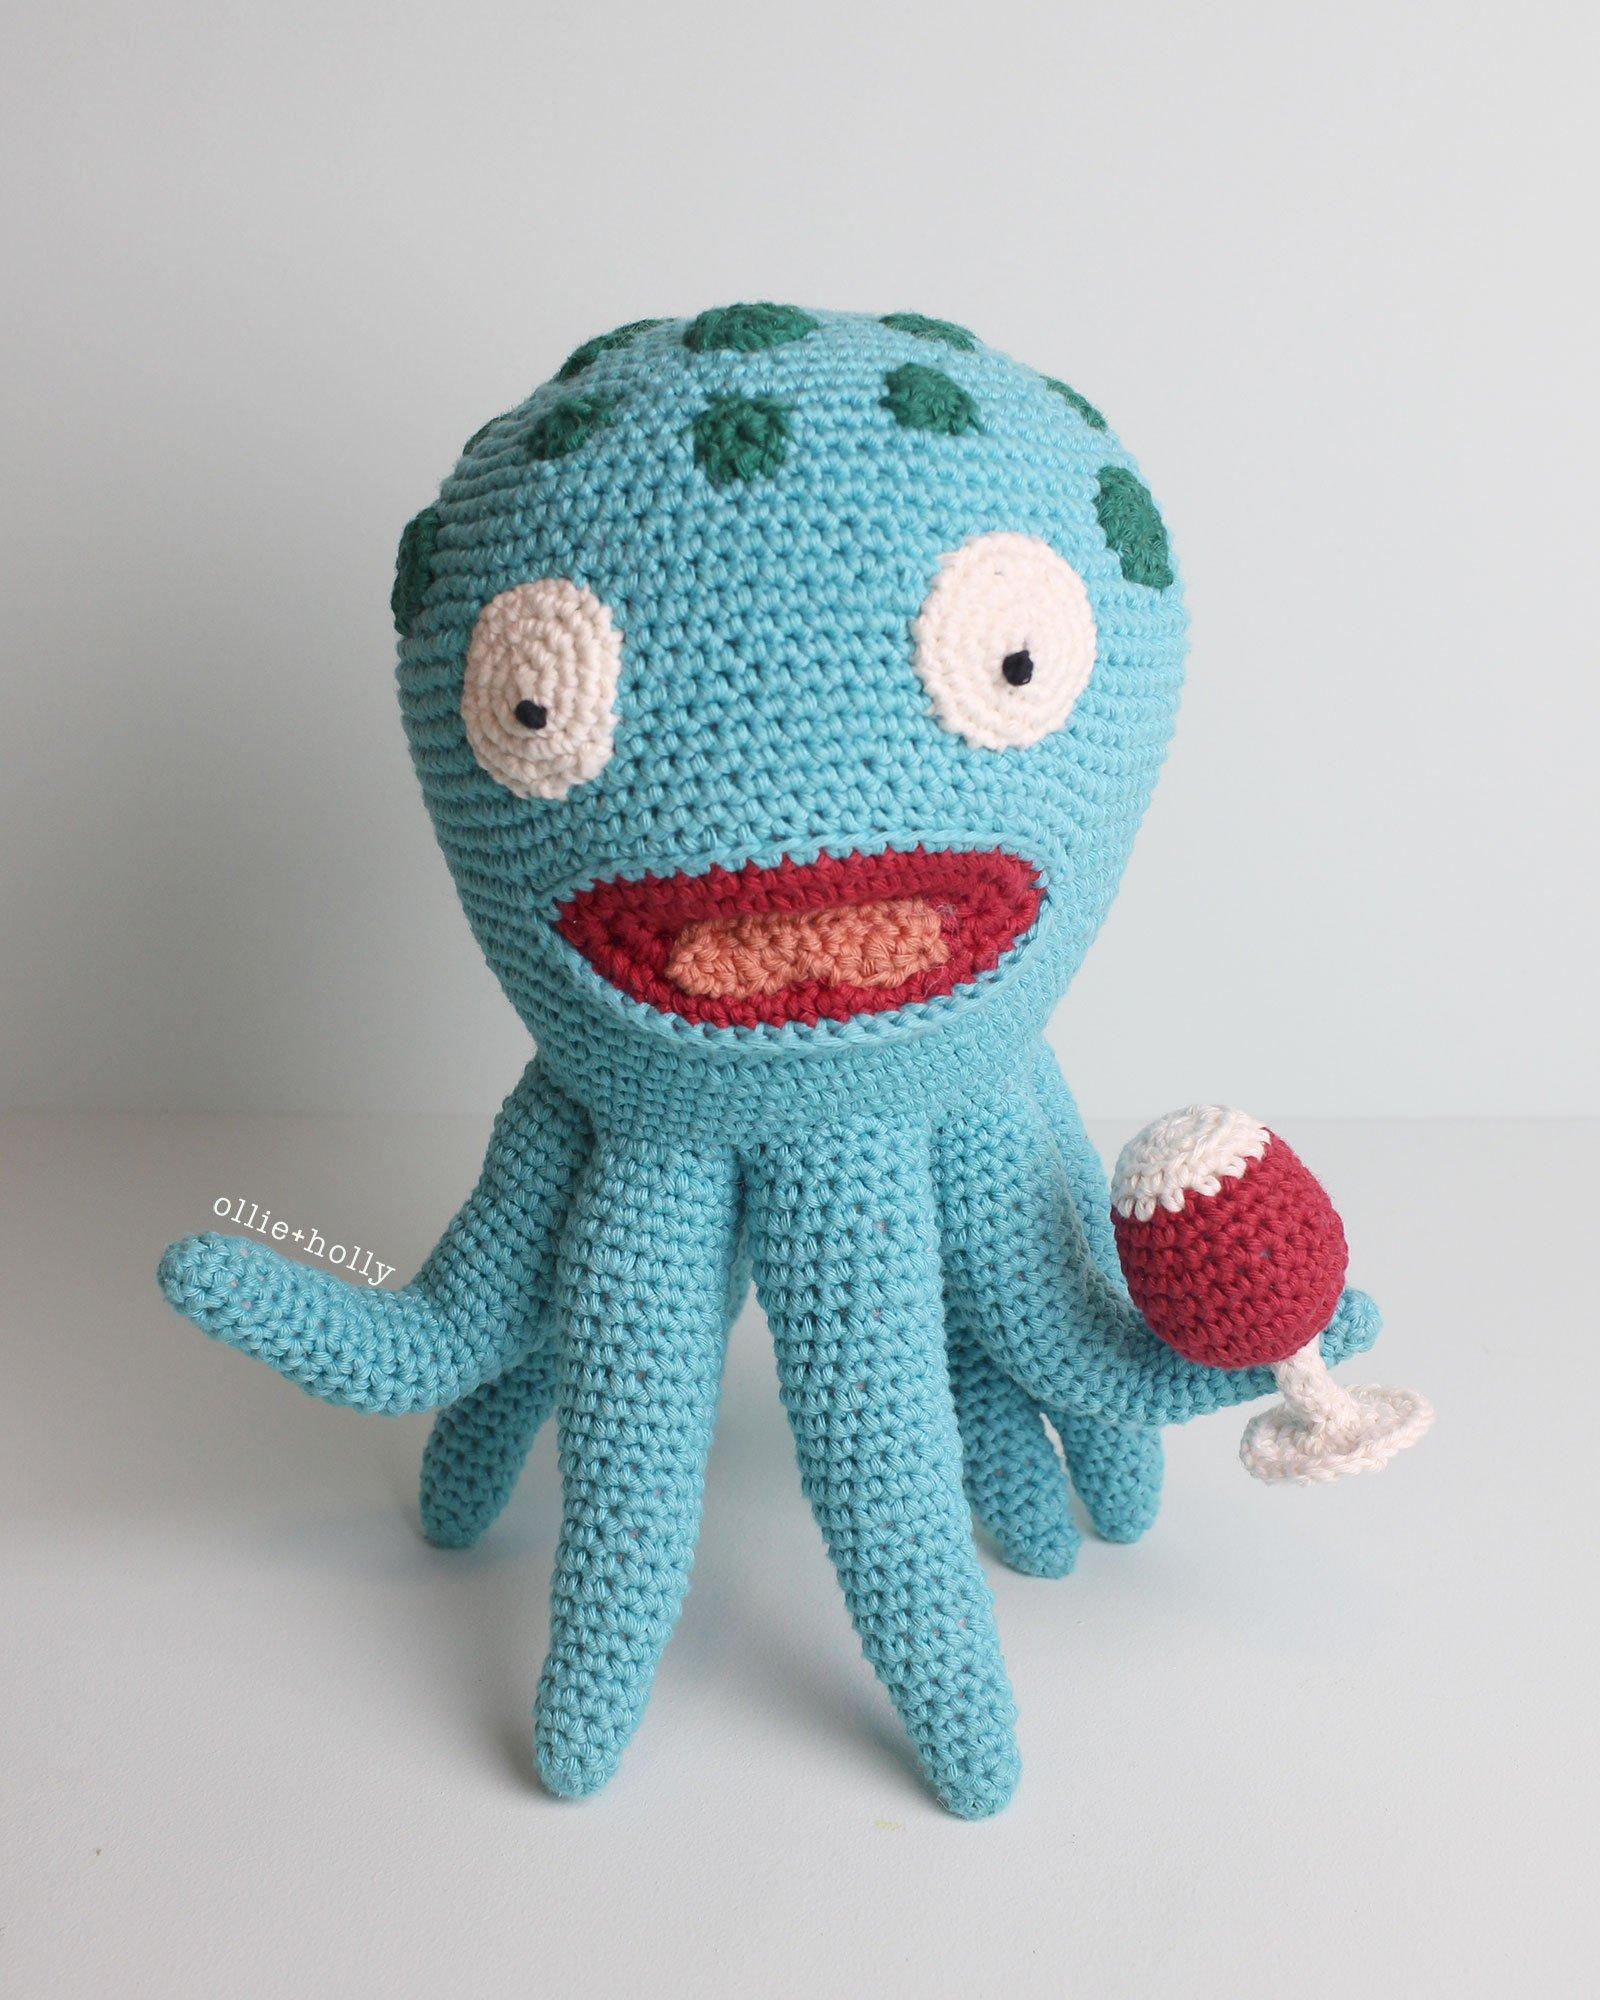 Akkoro Kamui from Bob's Burgers Amigurumi Crochet Stuffed Toy Animal (Pattern Only)